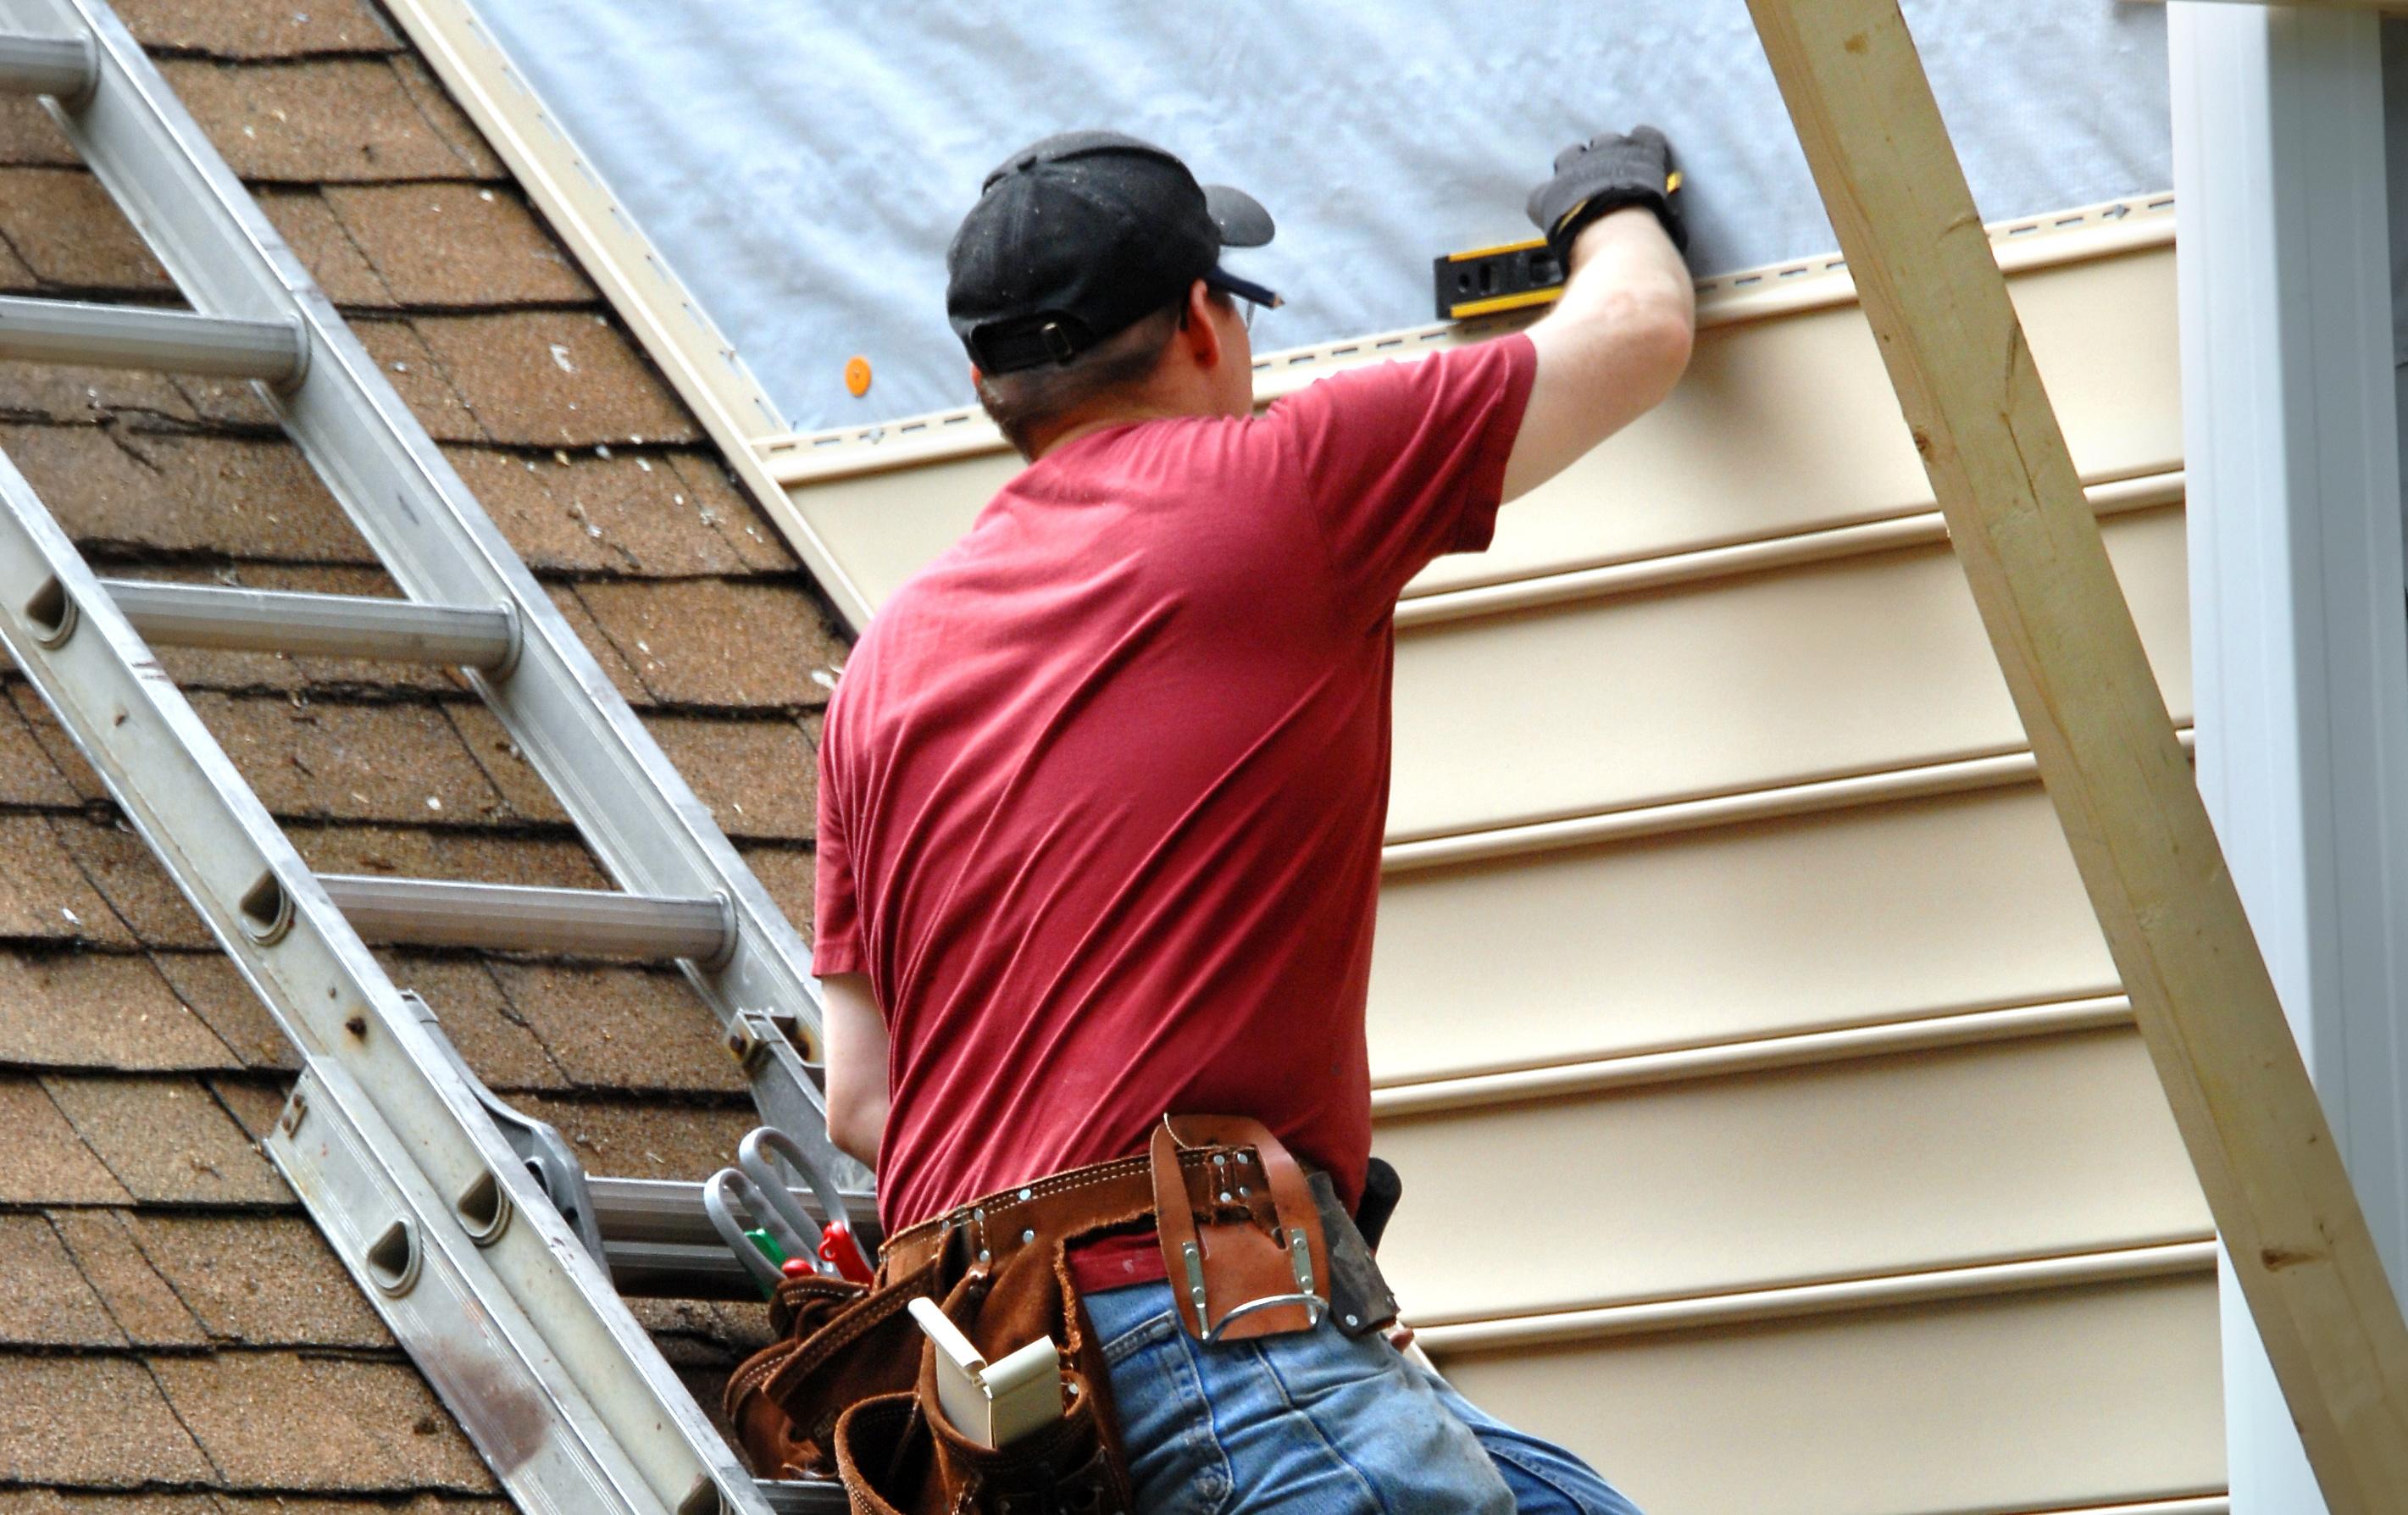 Siding Contractor Omaha NE - Emerald Roofing